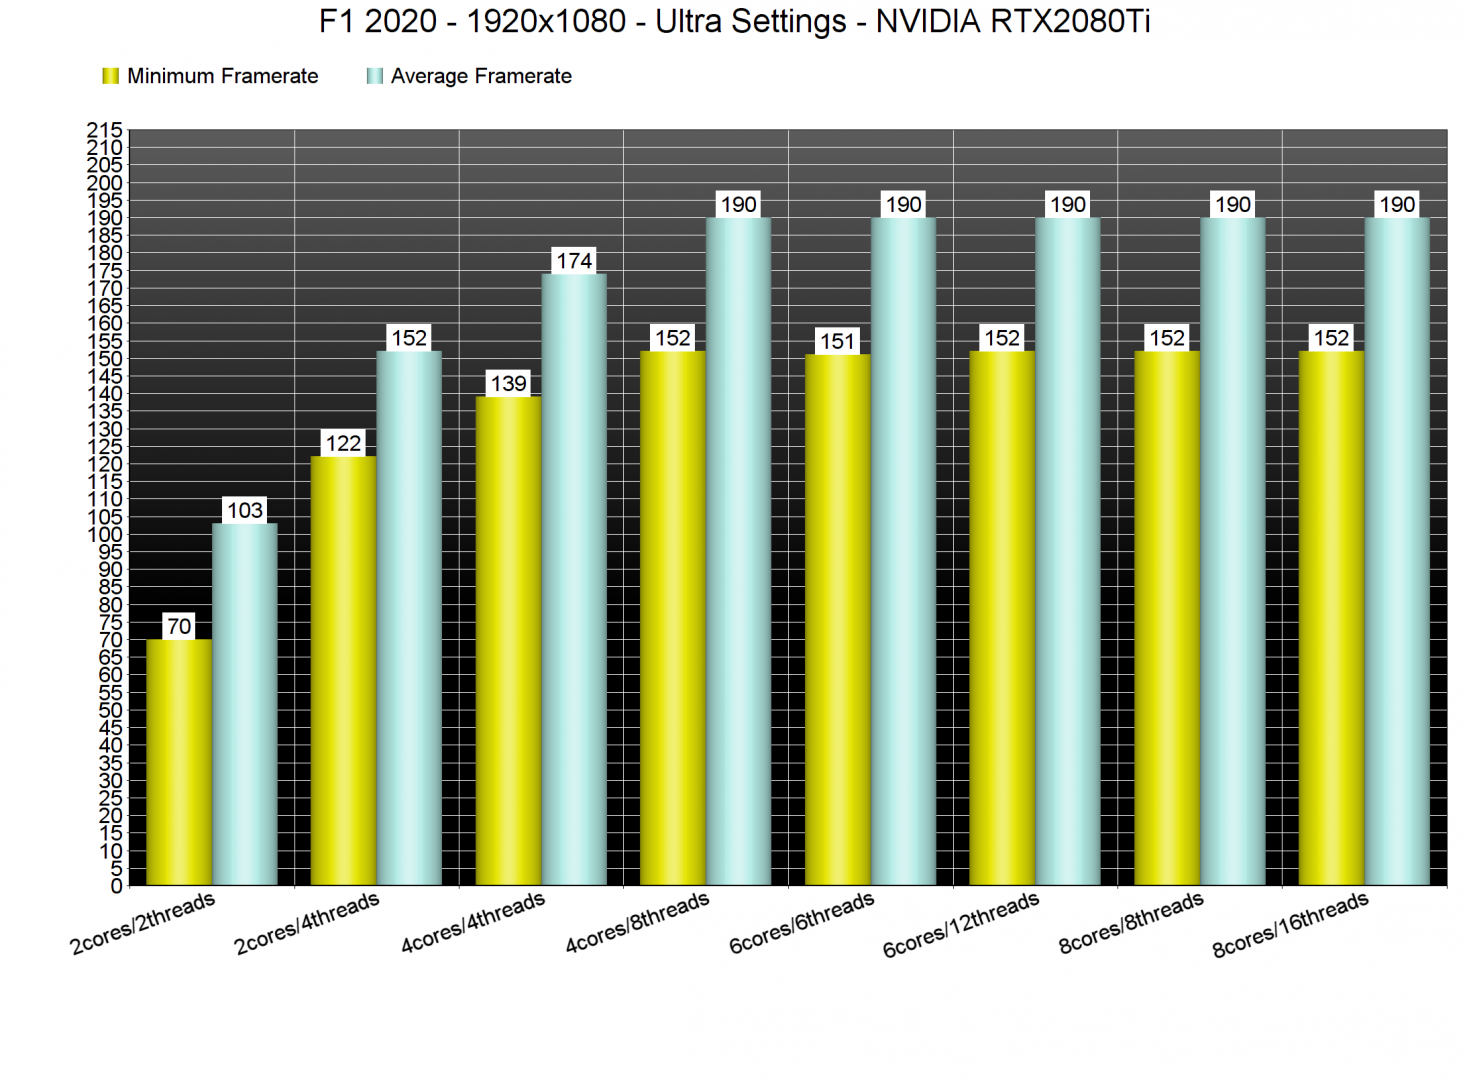 F1 2020 CPU benchmarks